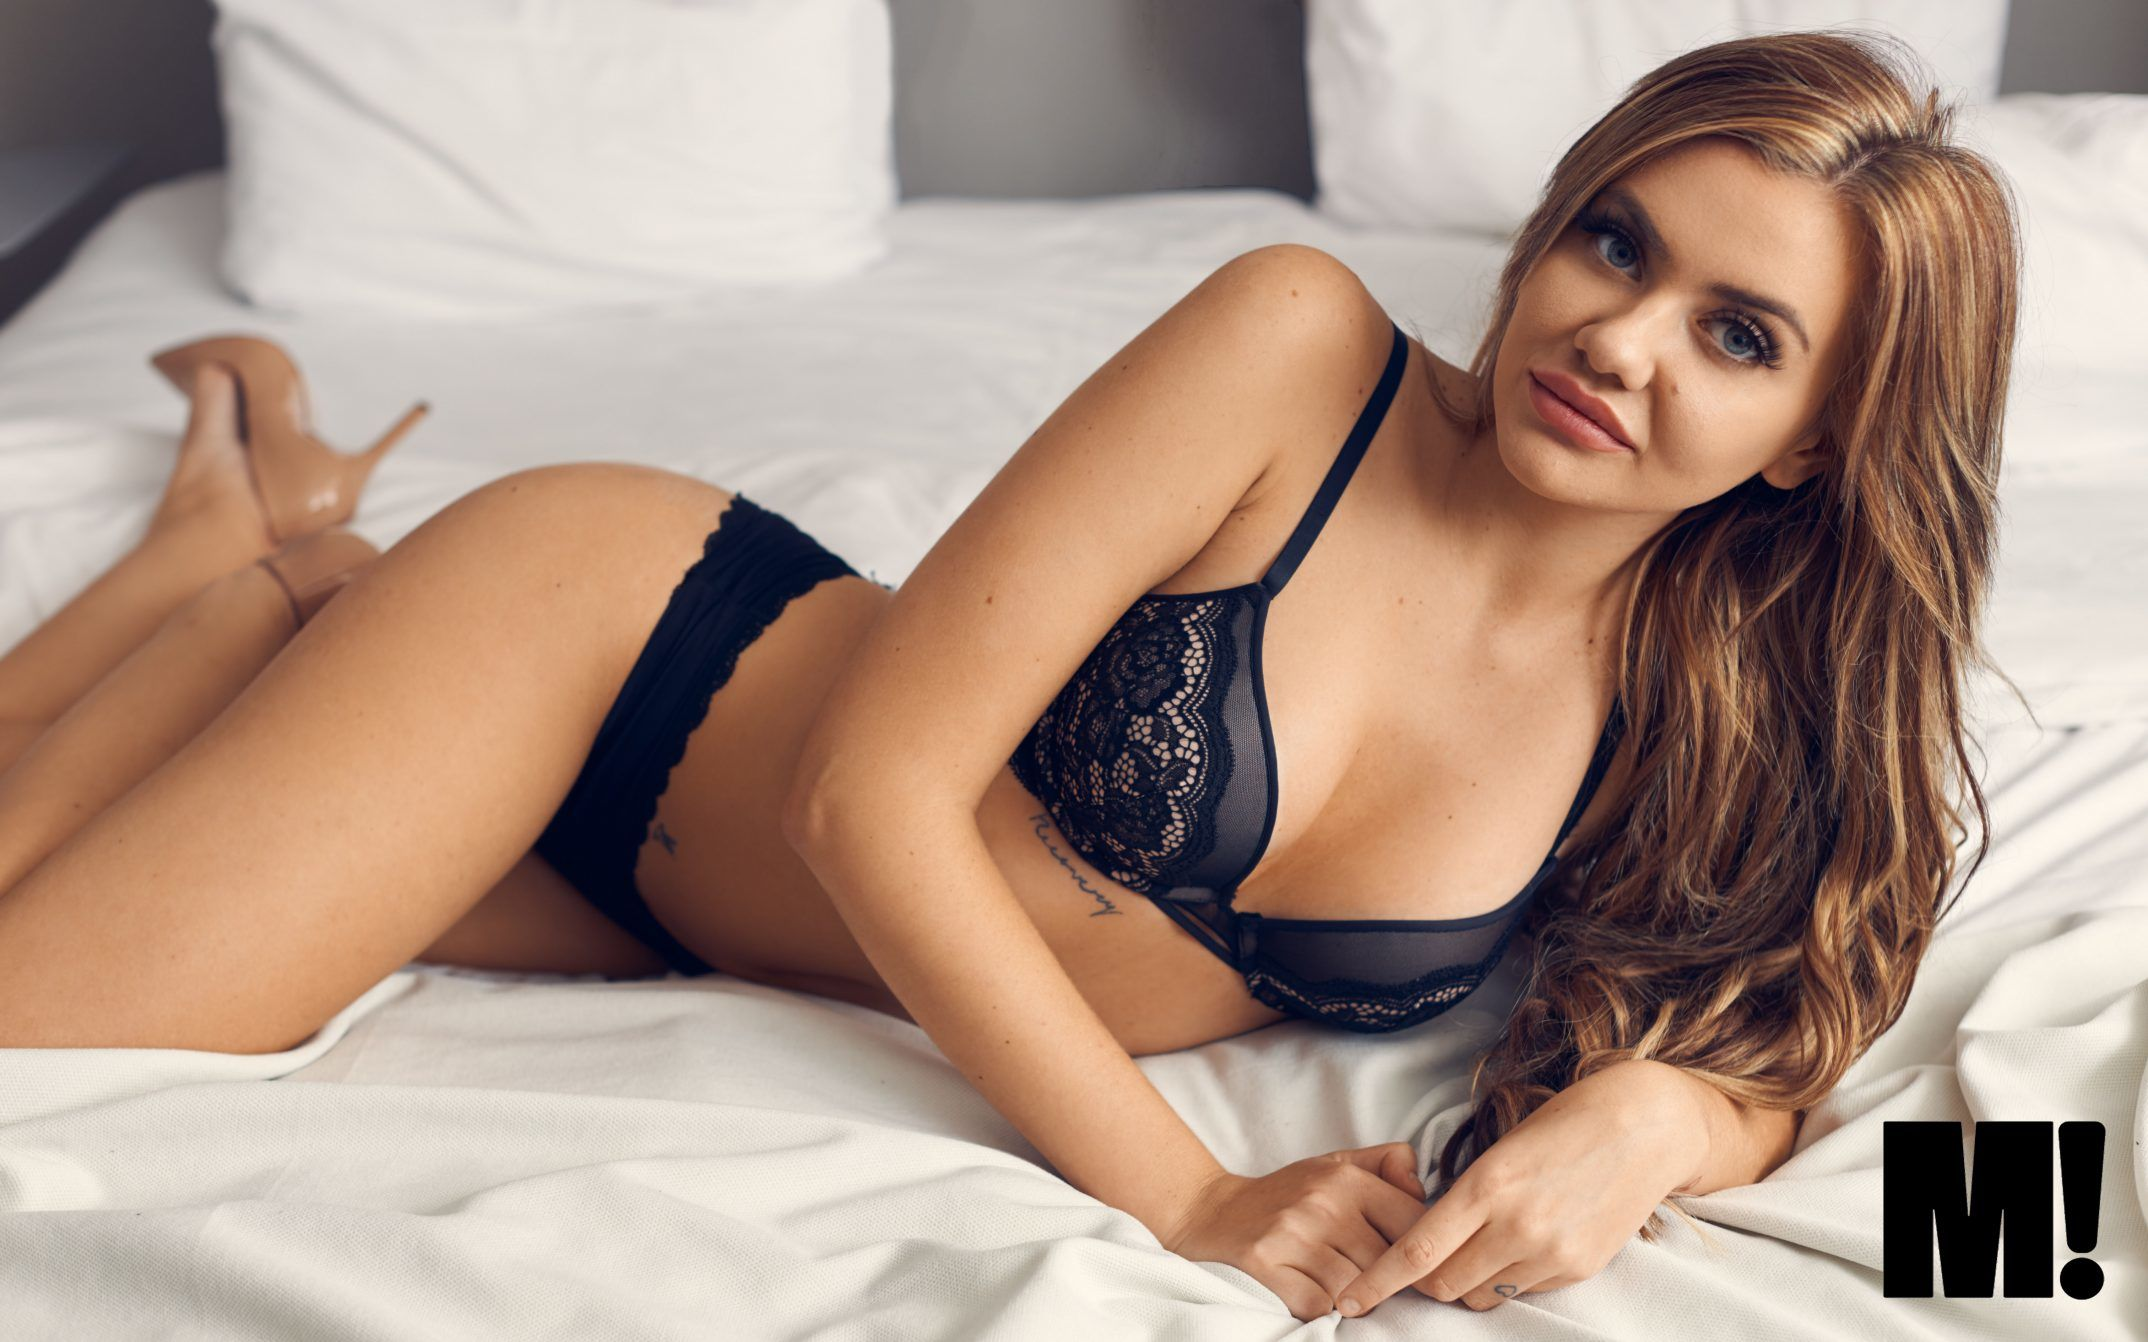 Fie Laursen lingerie undertøj seng brunette M! youtuber seng bed